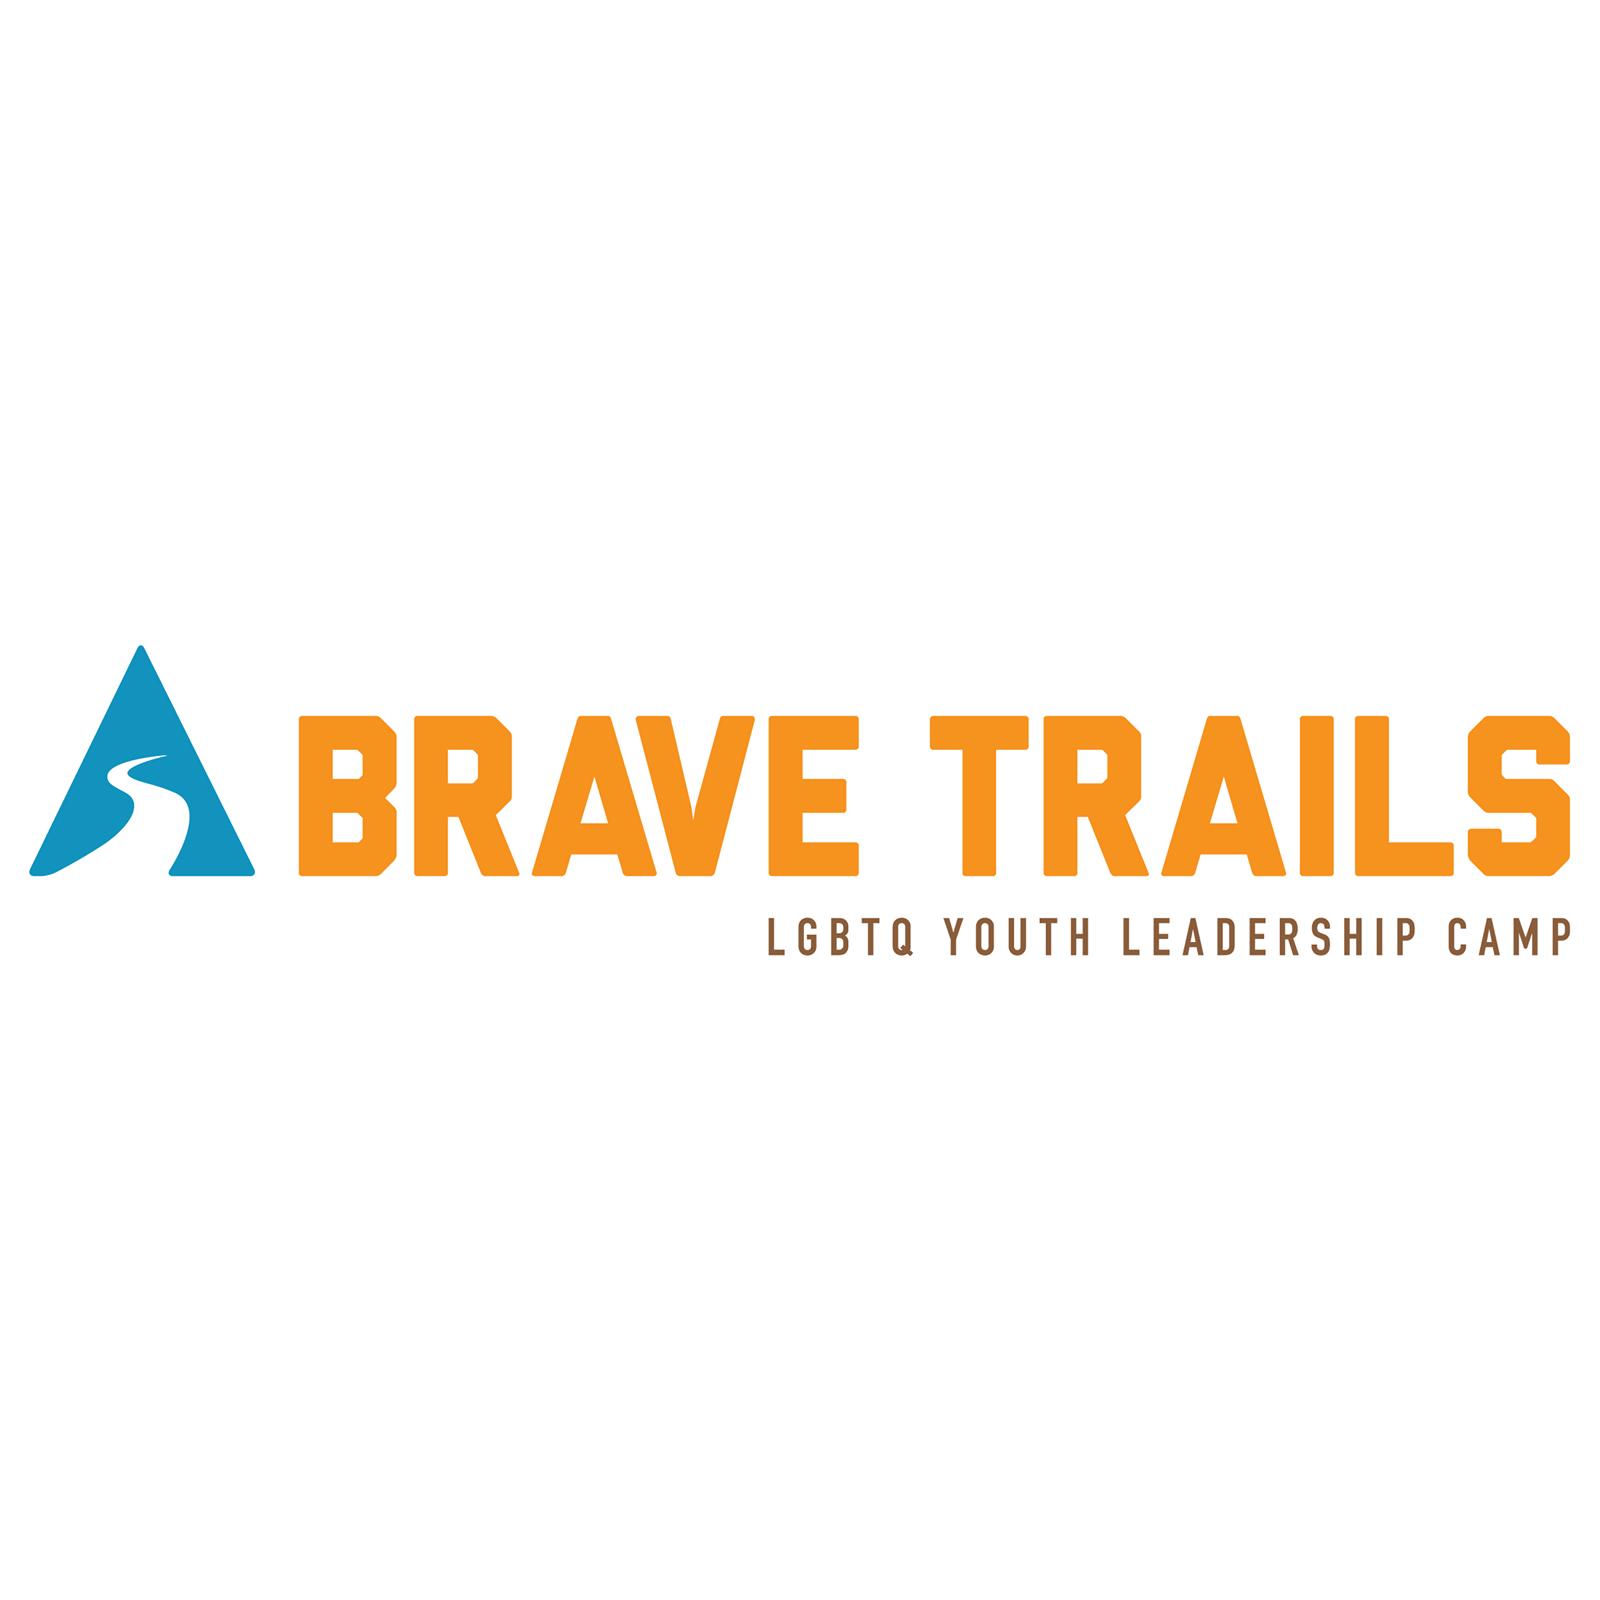 Brave Trails